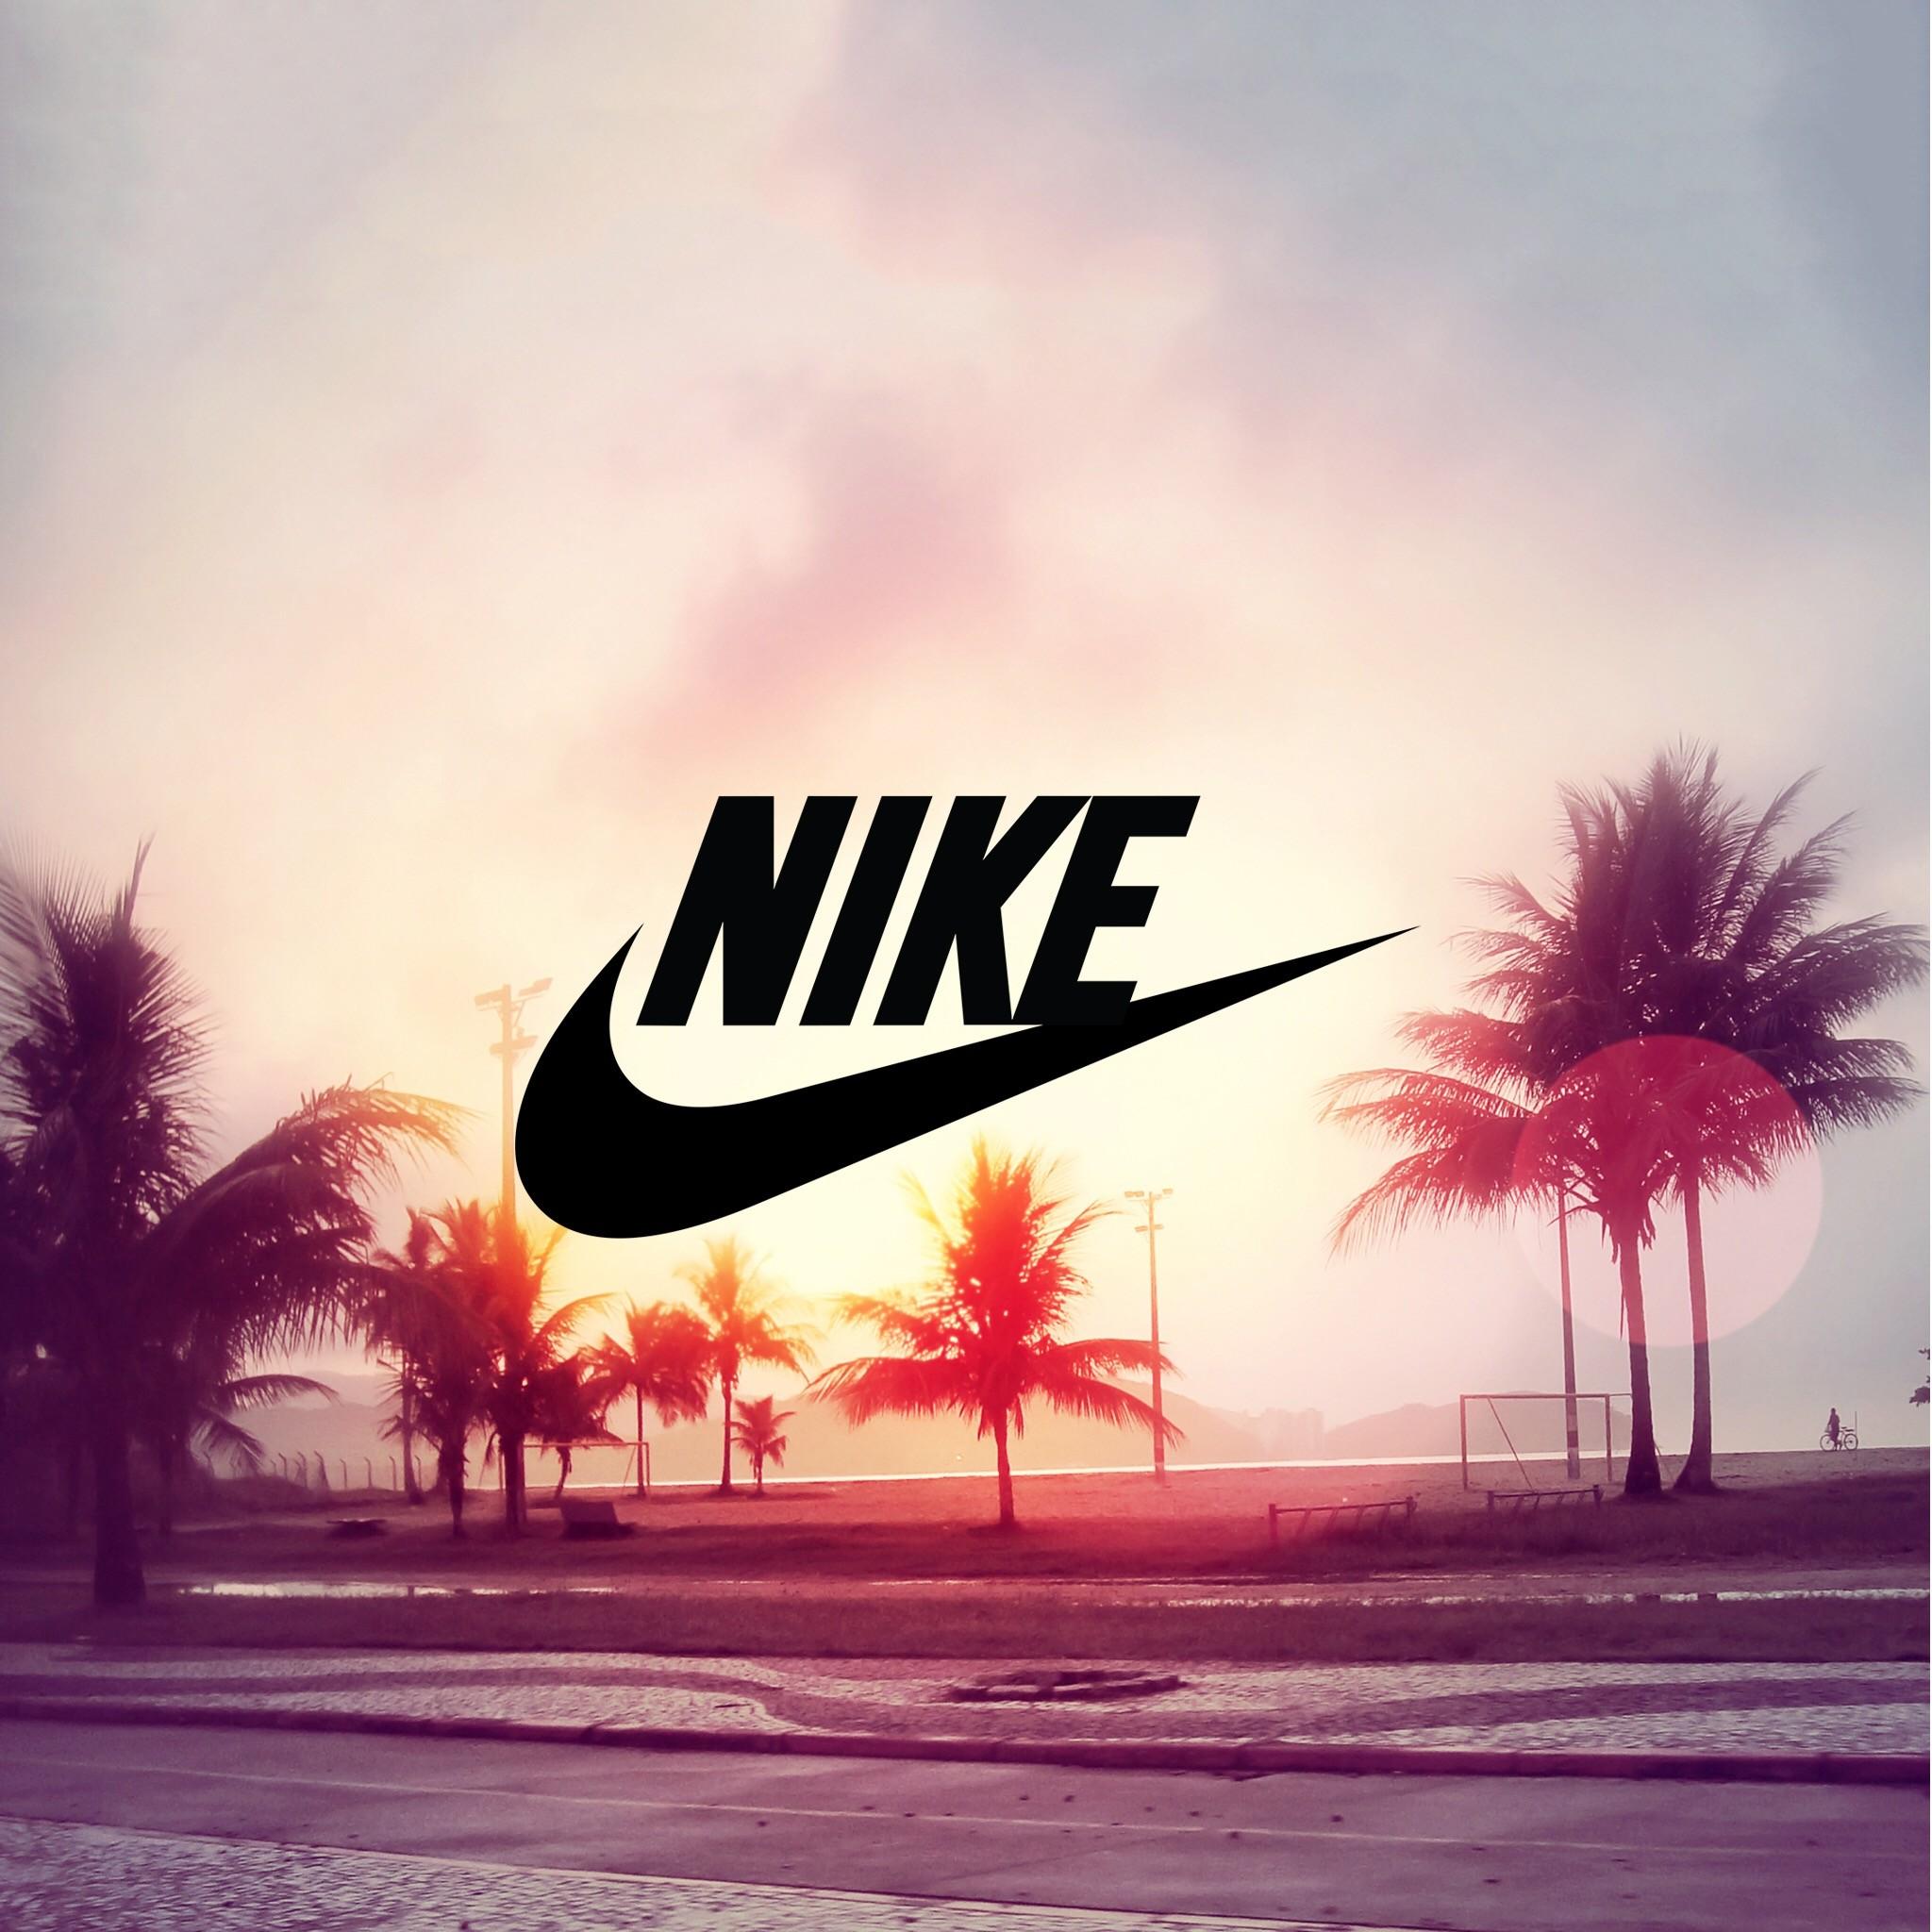 Nike Running Wallpaper (62+ Images